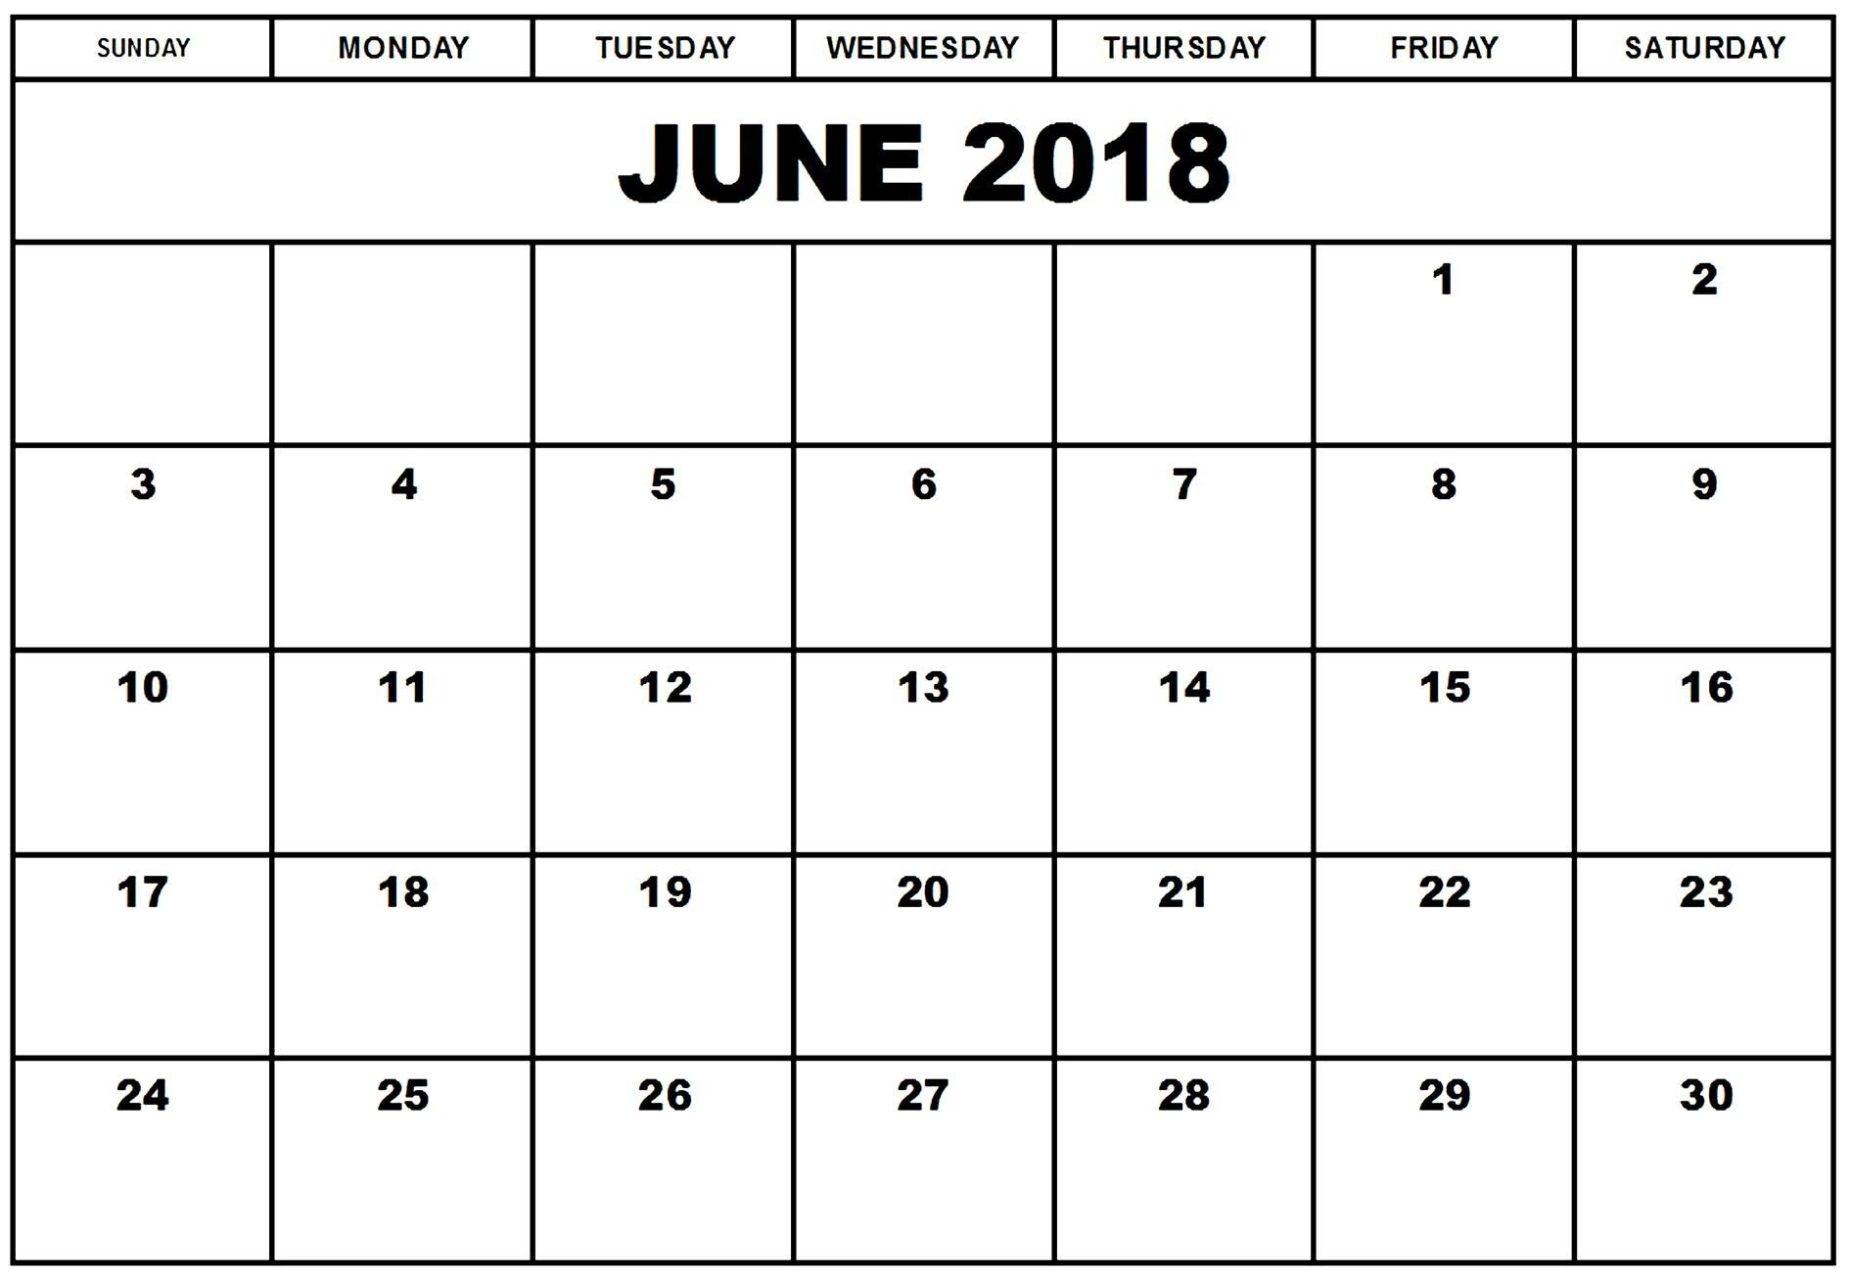 Calendar June 2018 Monthly - Calendar Printable With Holidays  June And July Calendar Printable